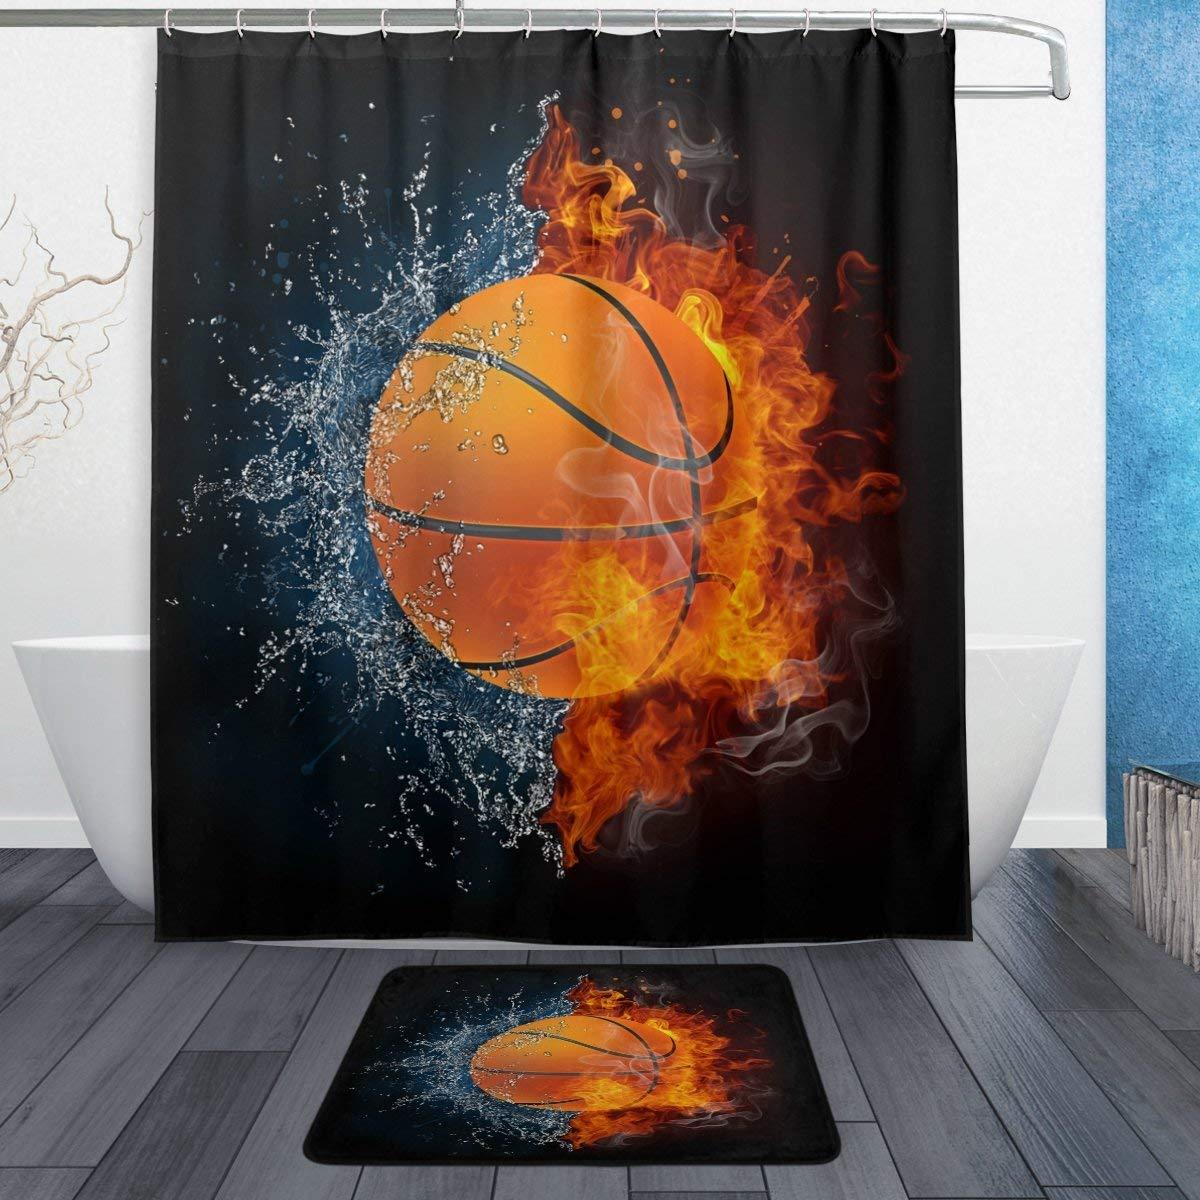 Flame Basketball Shower Curtain Bath Mat Toilet Cover Rug Bathroom Decor Set